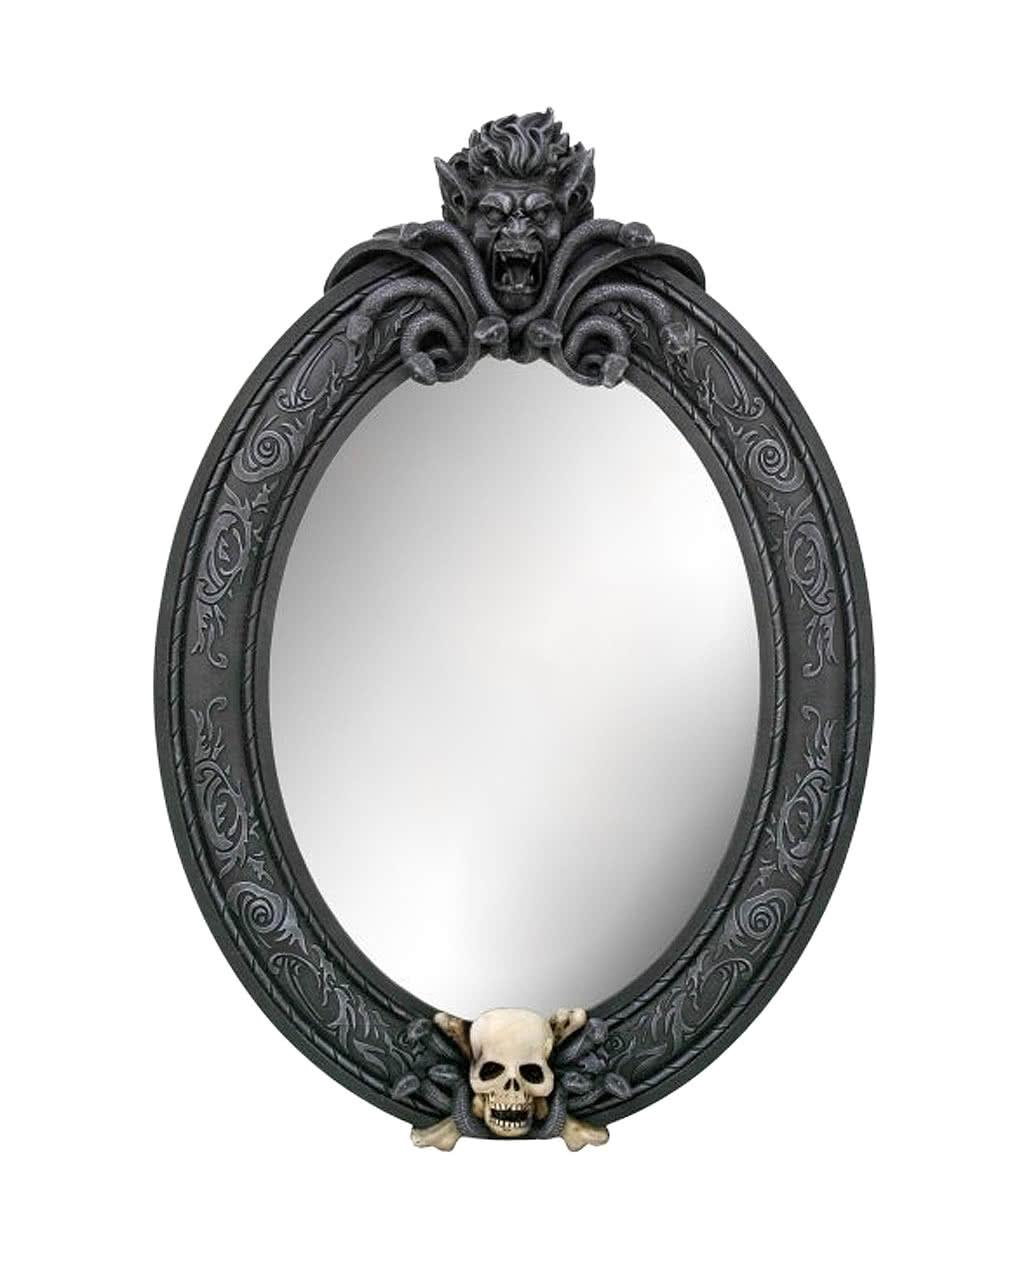 medusa wandspiegel mit totenkopf gothic deko horror. Black Bedroom Furniture Sets. Home Design Ideas